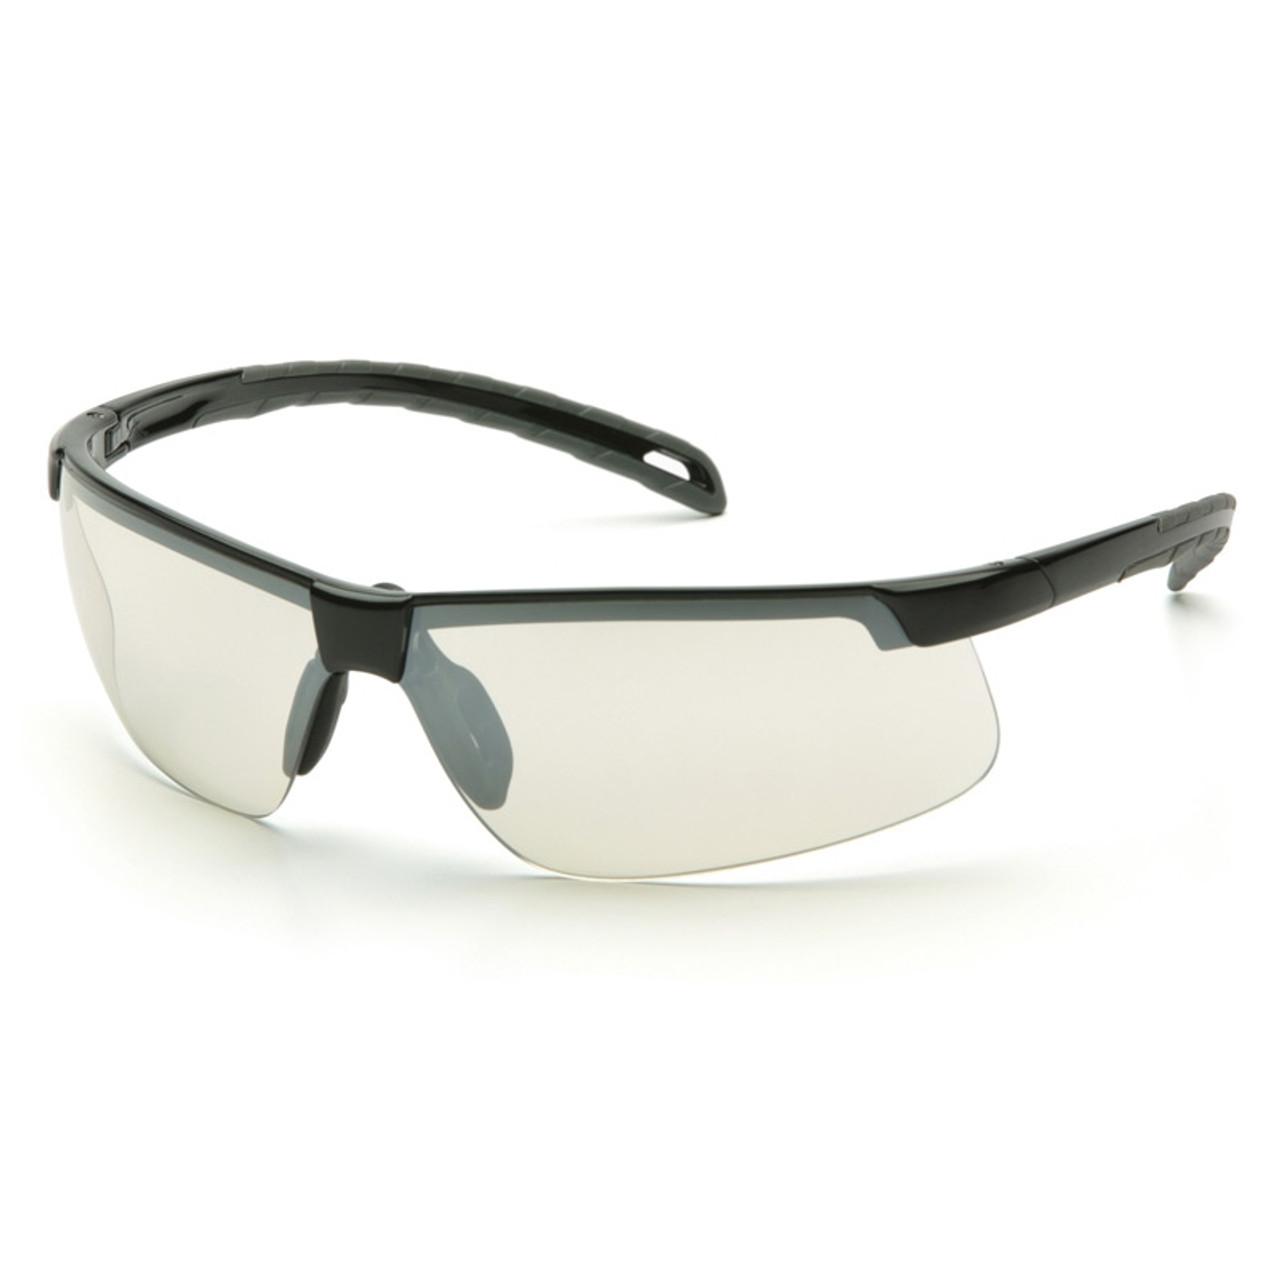 7206e1f4202 SB8680DT Safety Glasses Ever-Lite Indoor-Outdoor Mirror Anti-Fog Black Frame  -